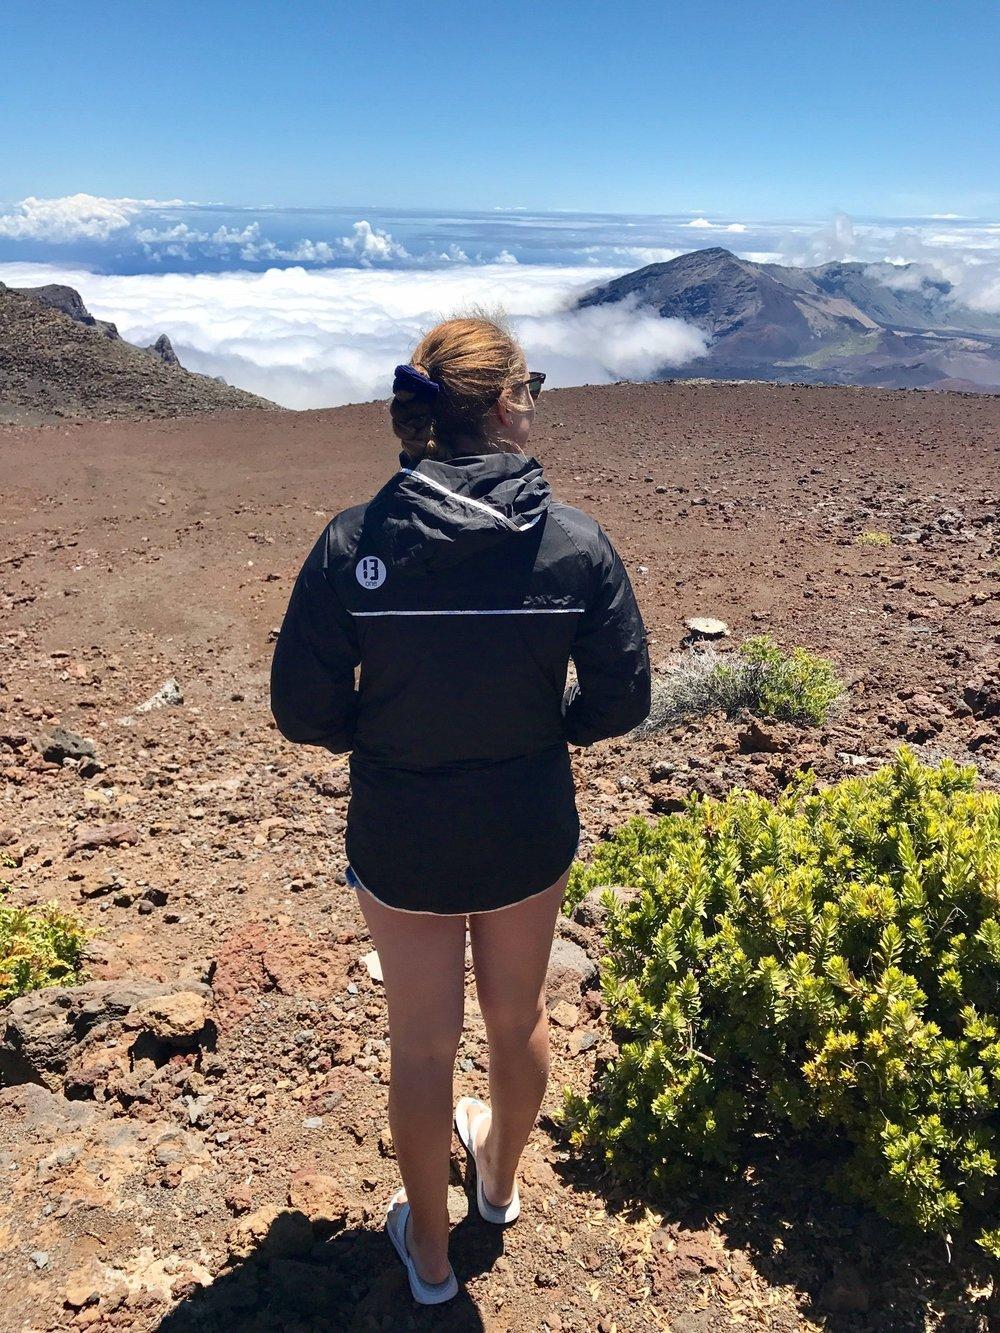 Hiking, 10,00 Feet Up In Haleakala Volcano Maui